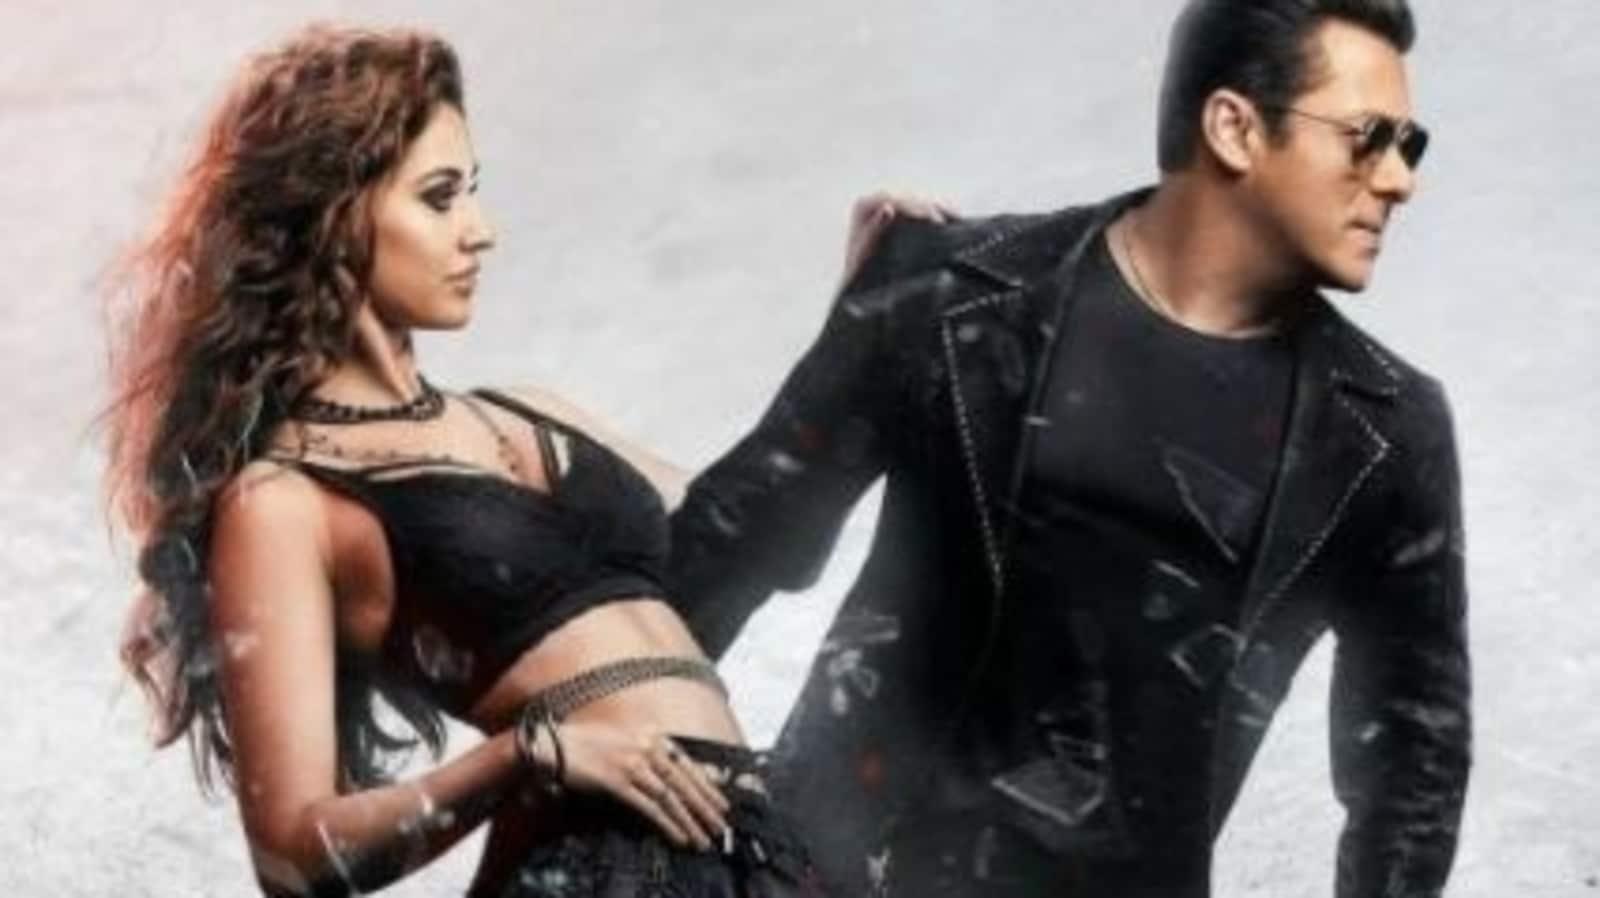 Disha Patani calls Radhe Your Most Wanted Bhai 'fun' movie: 'I haven't done  a massy film before'   Hindustan Times